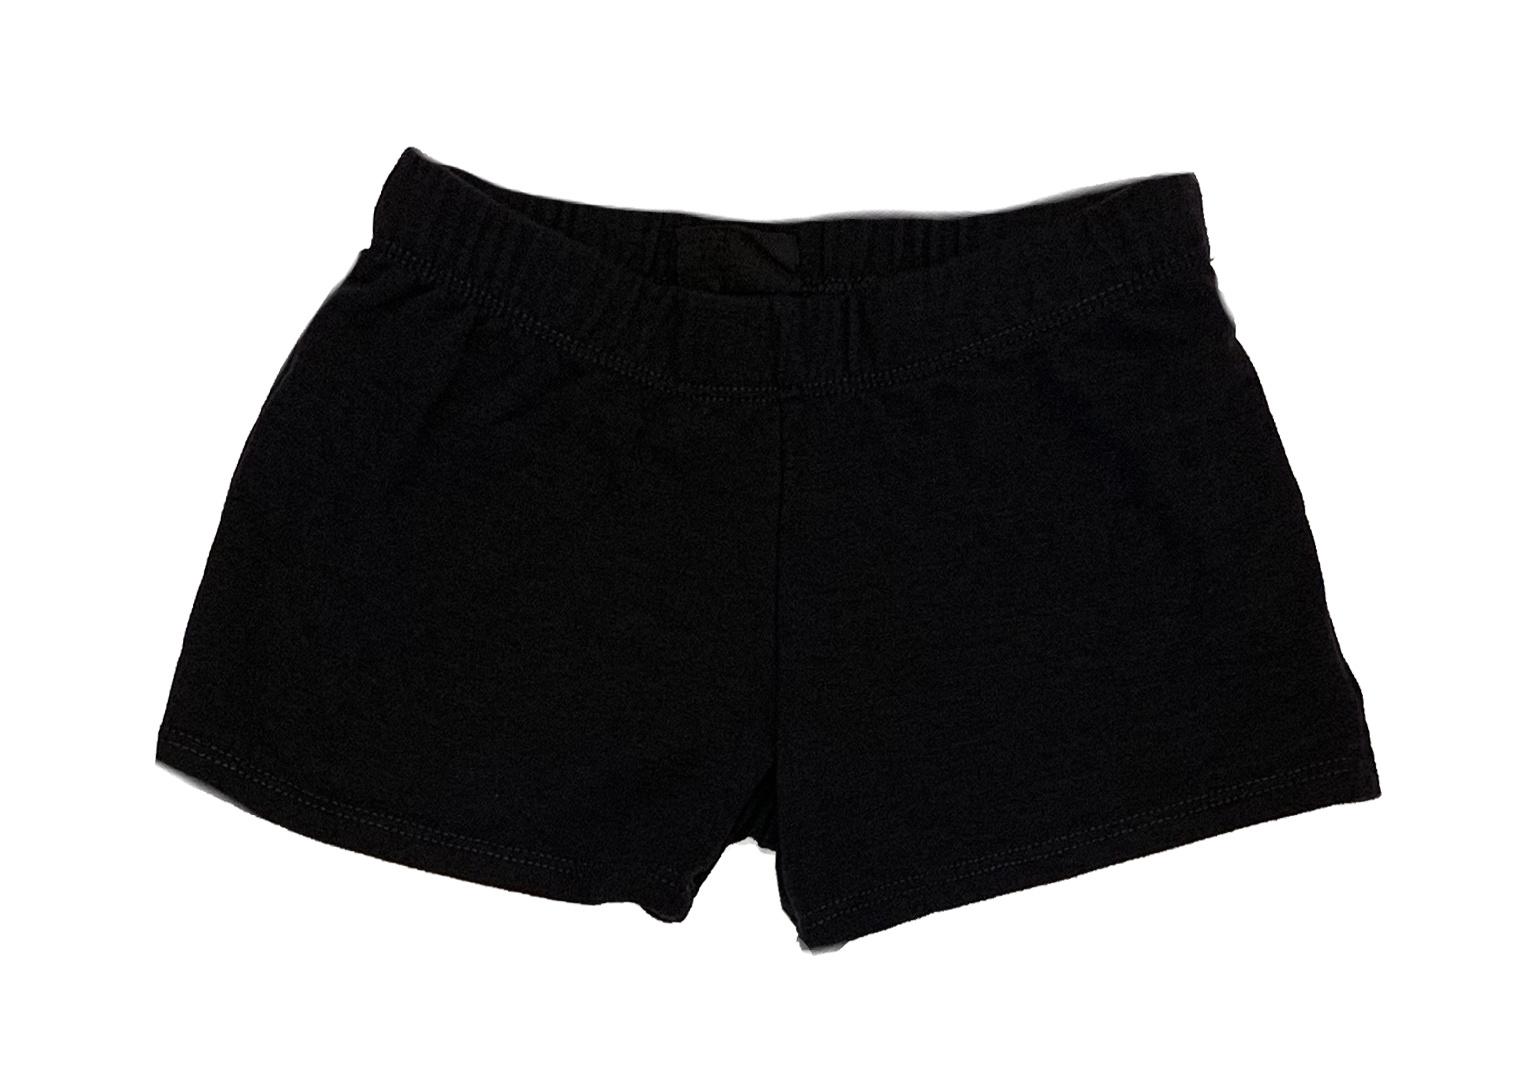 Firehouse Black Sweat Shorts Adult